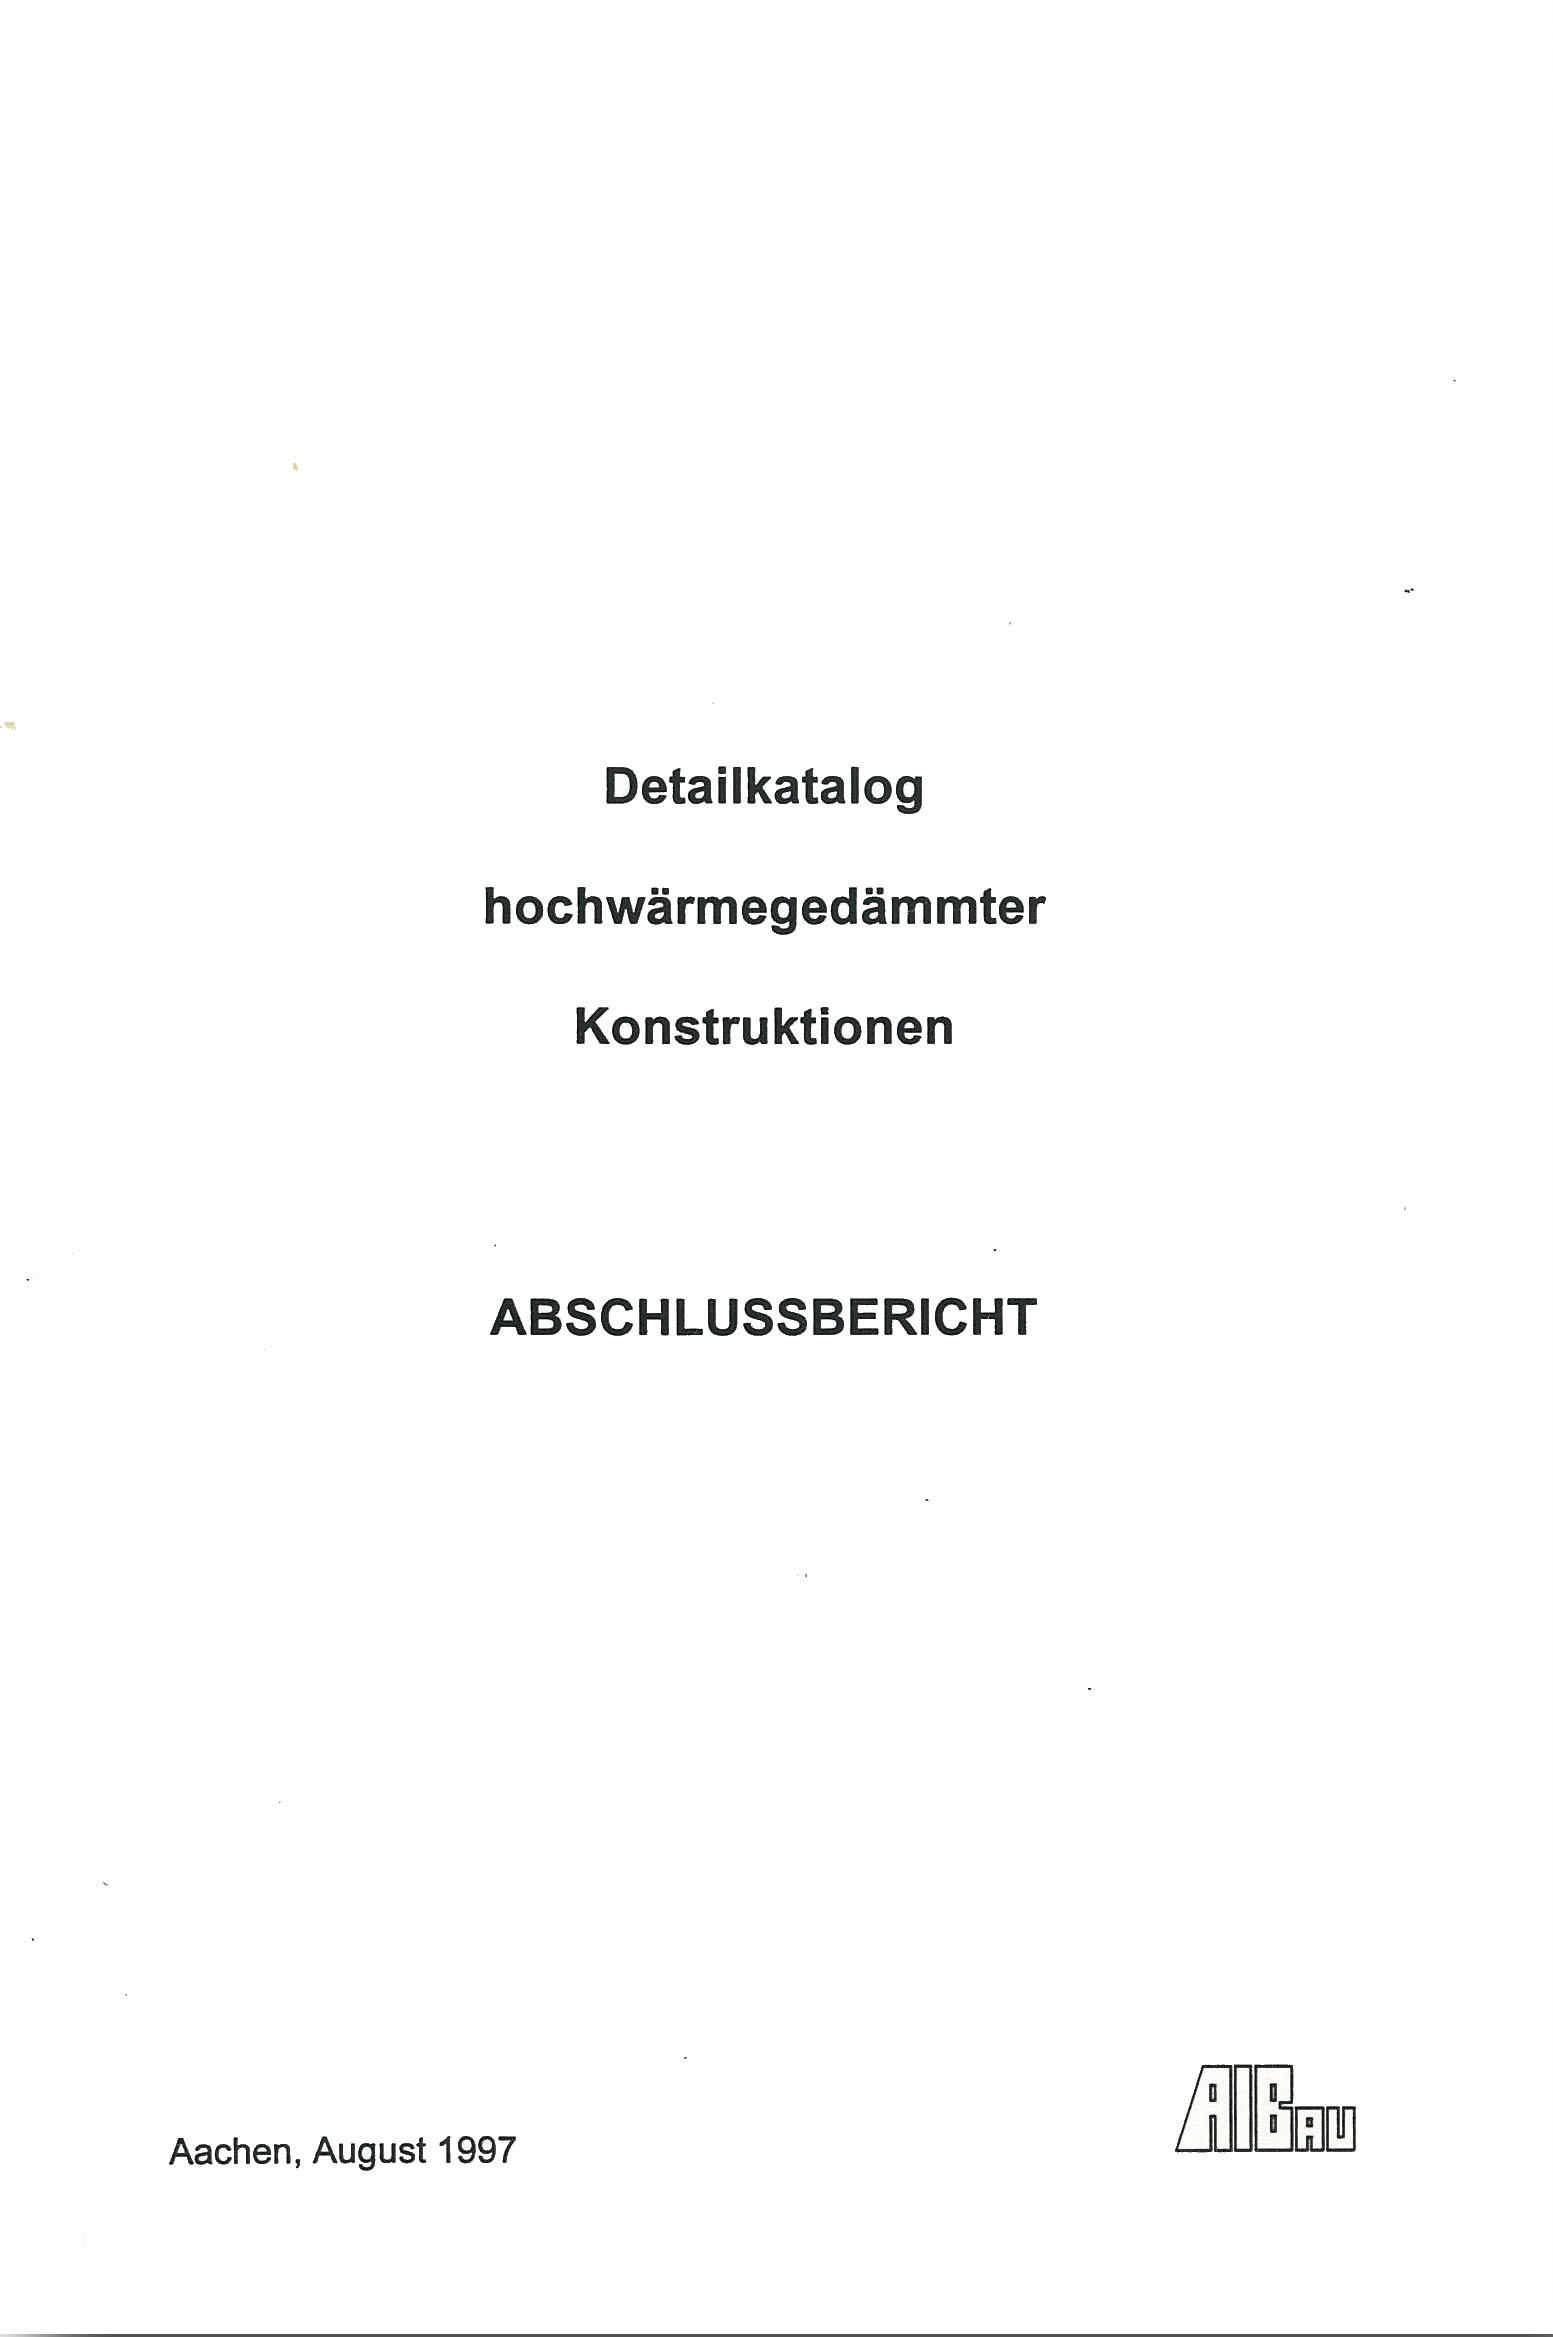 Forschungsbericht: Detailkatalog hochwärmegedämmter Konstruktionen - Coverbild